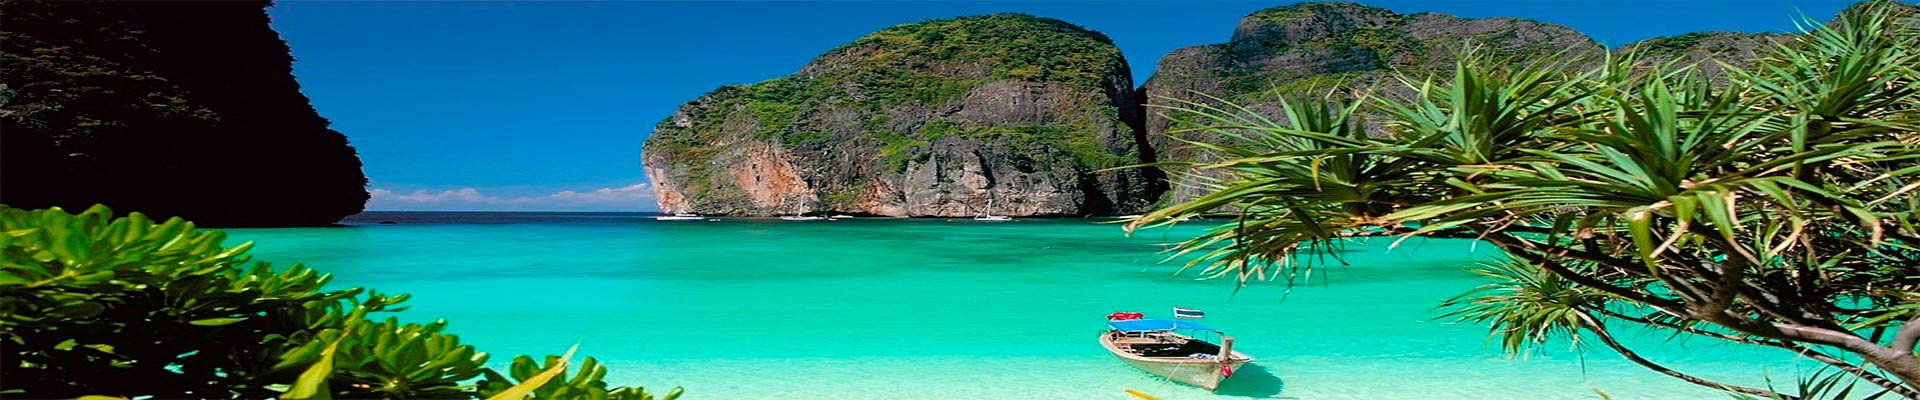 Ilhas Phi Phi e Krabi